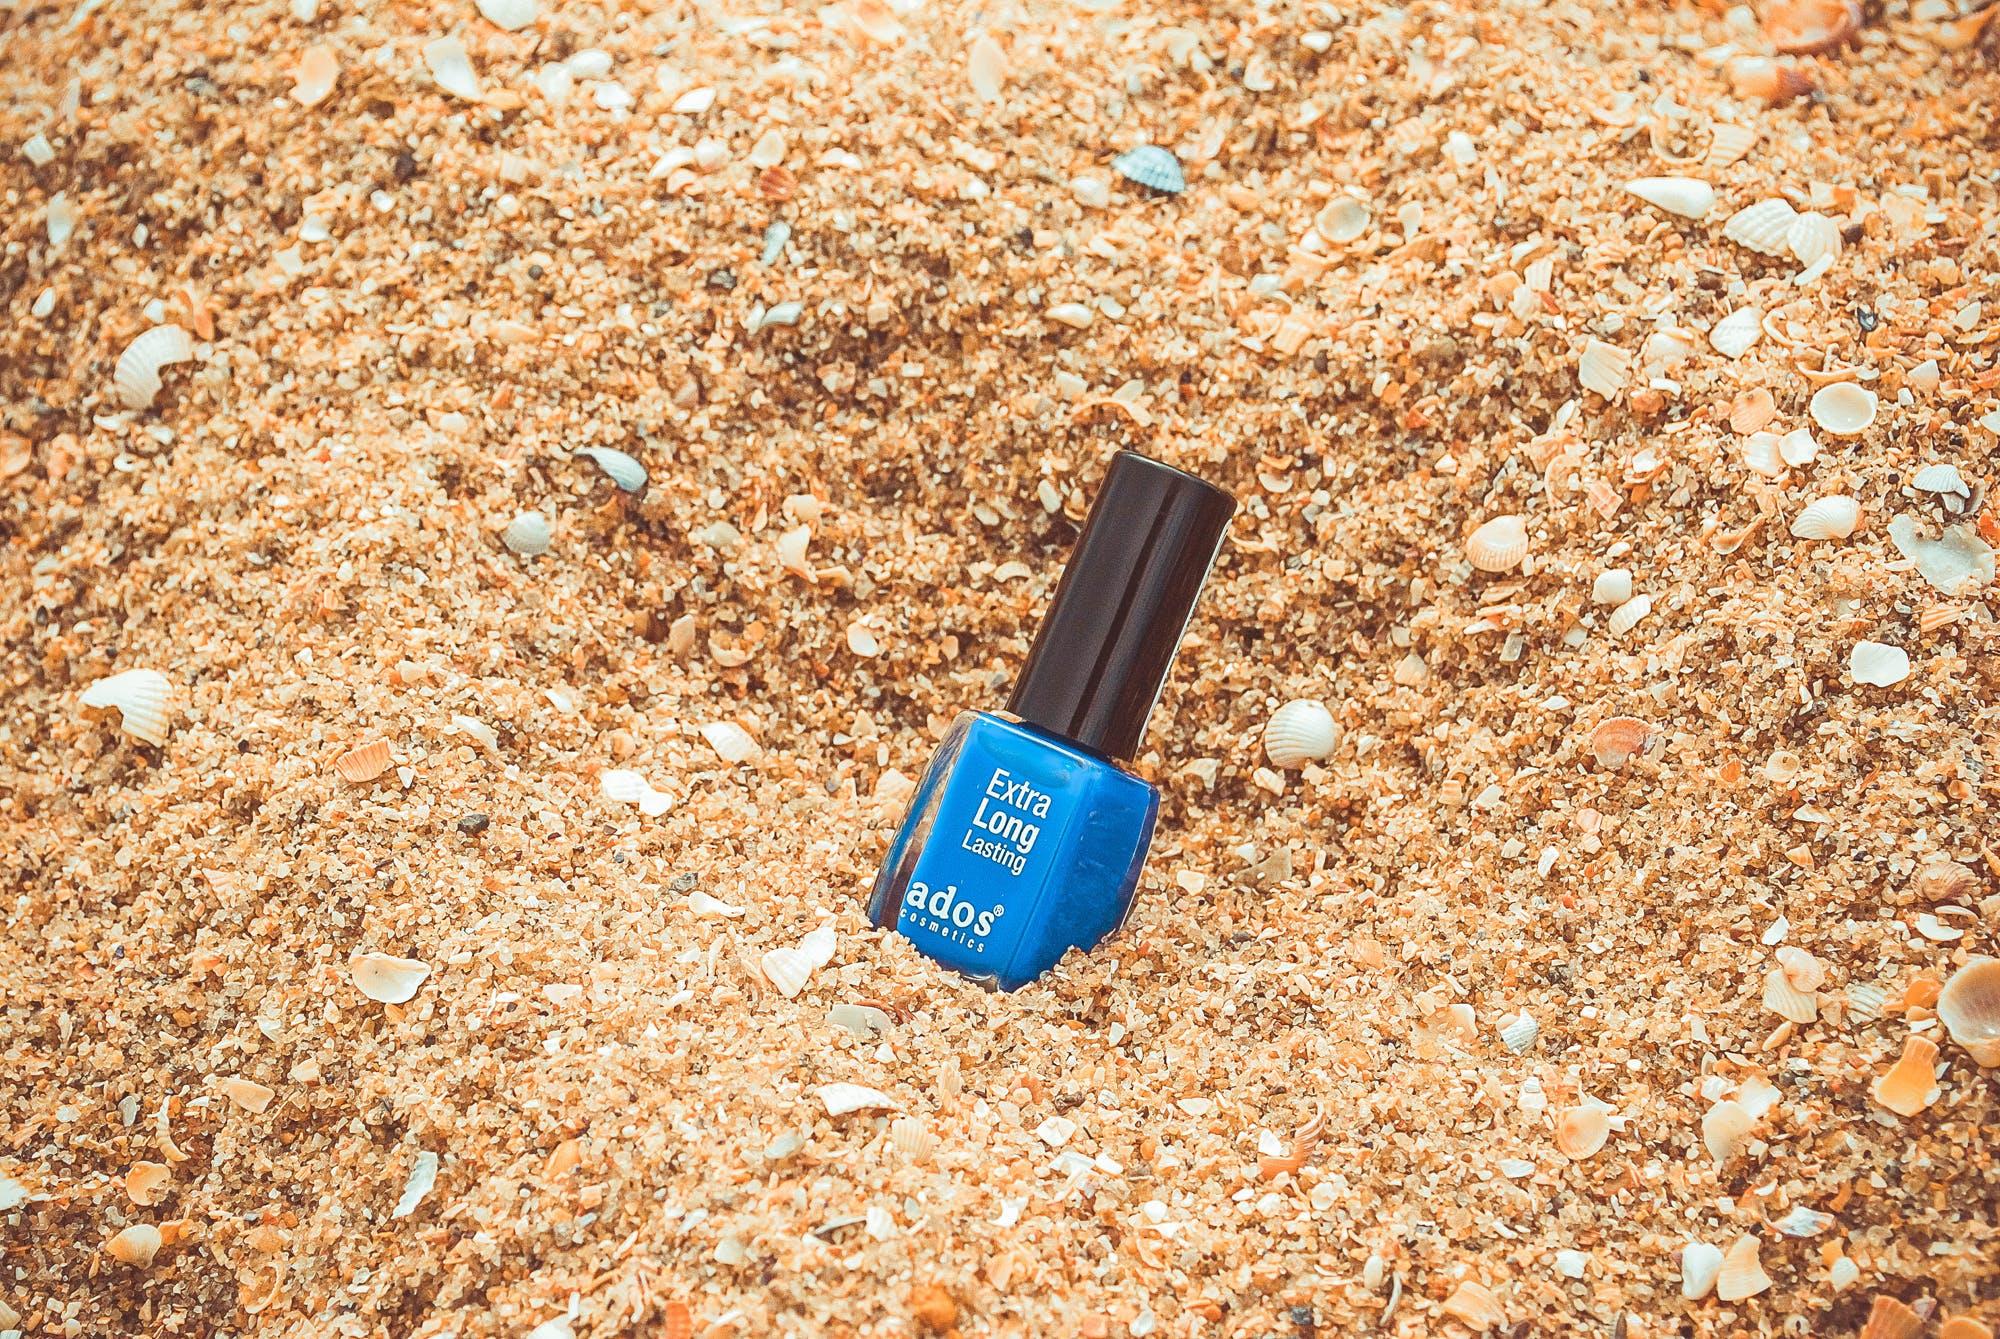 Blue Nail Polish Bottle